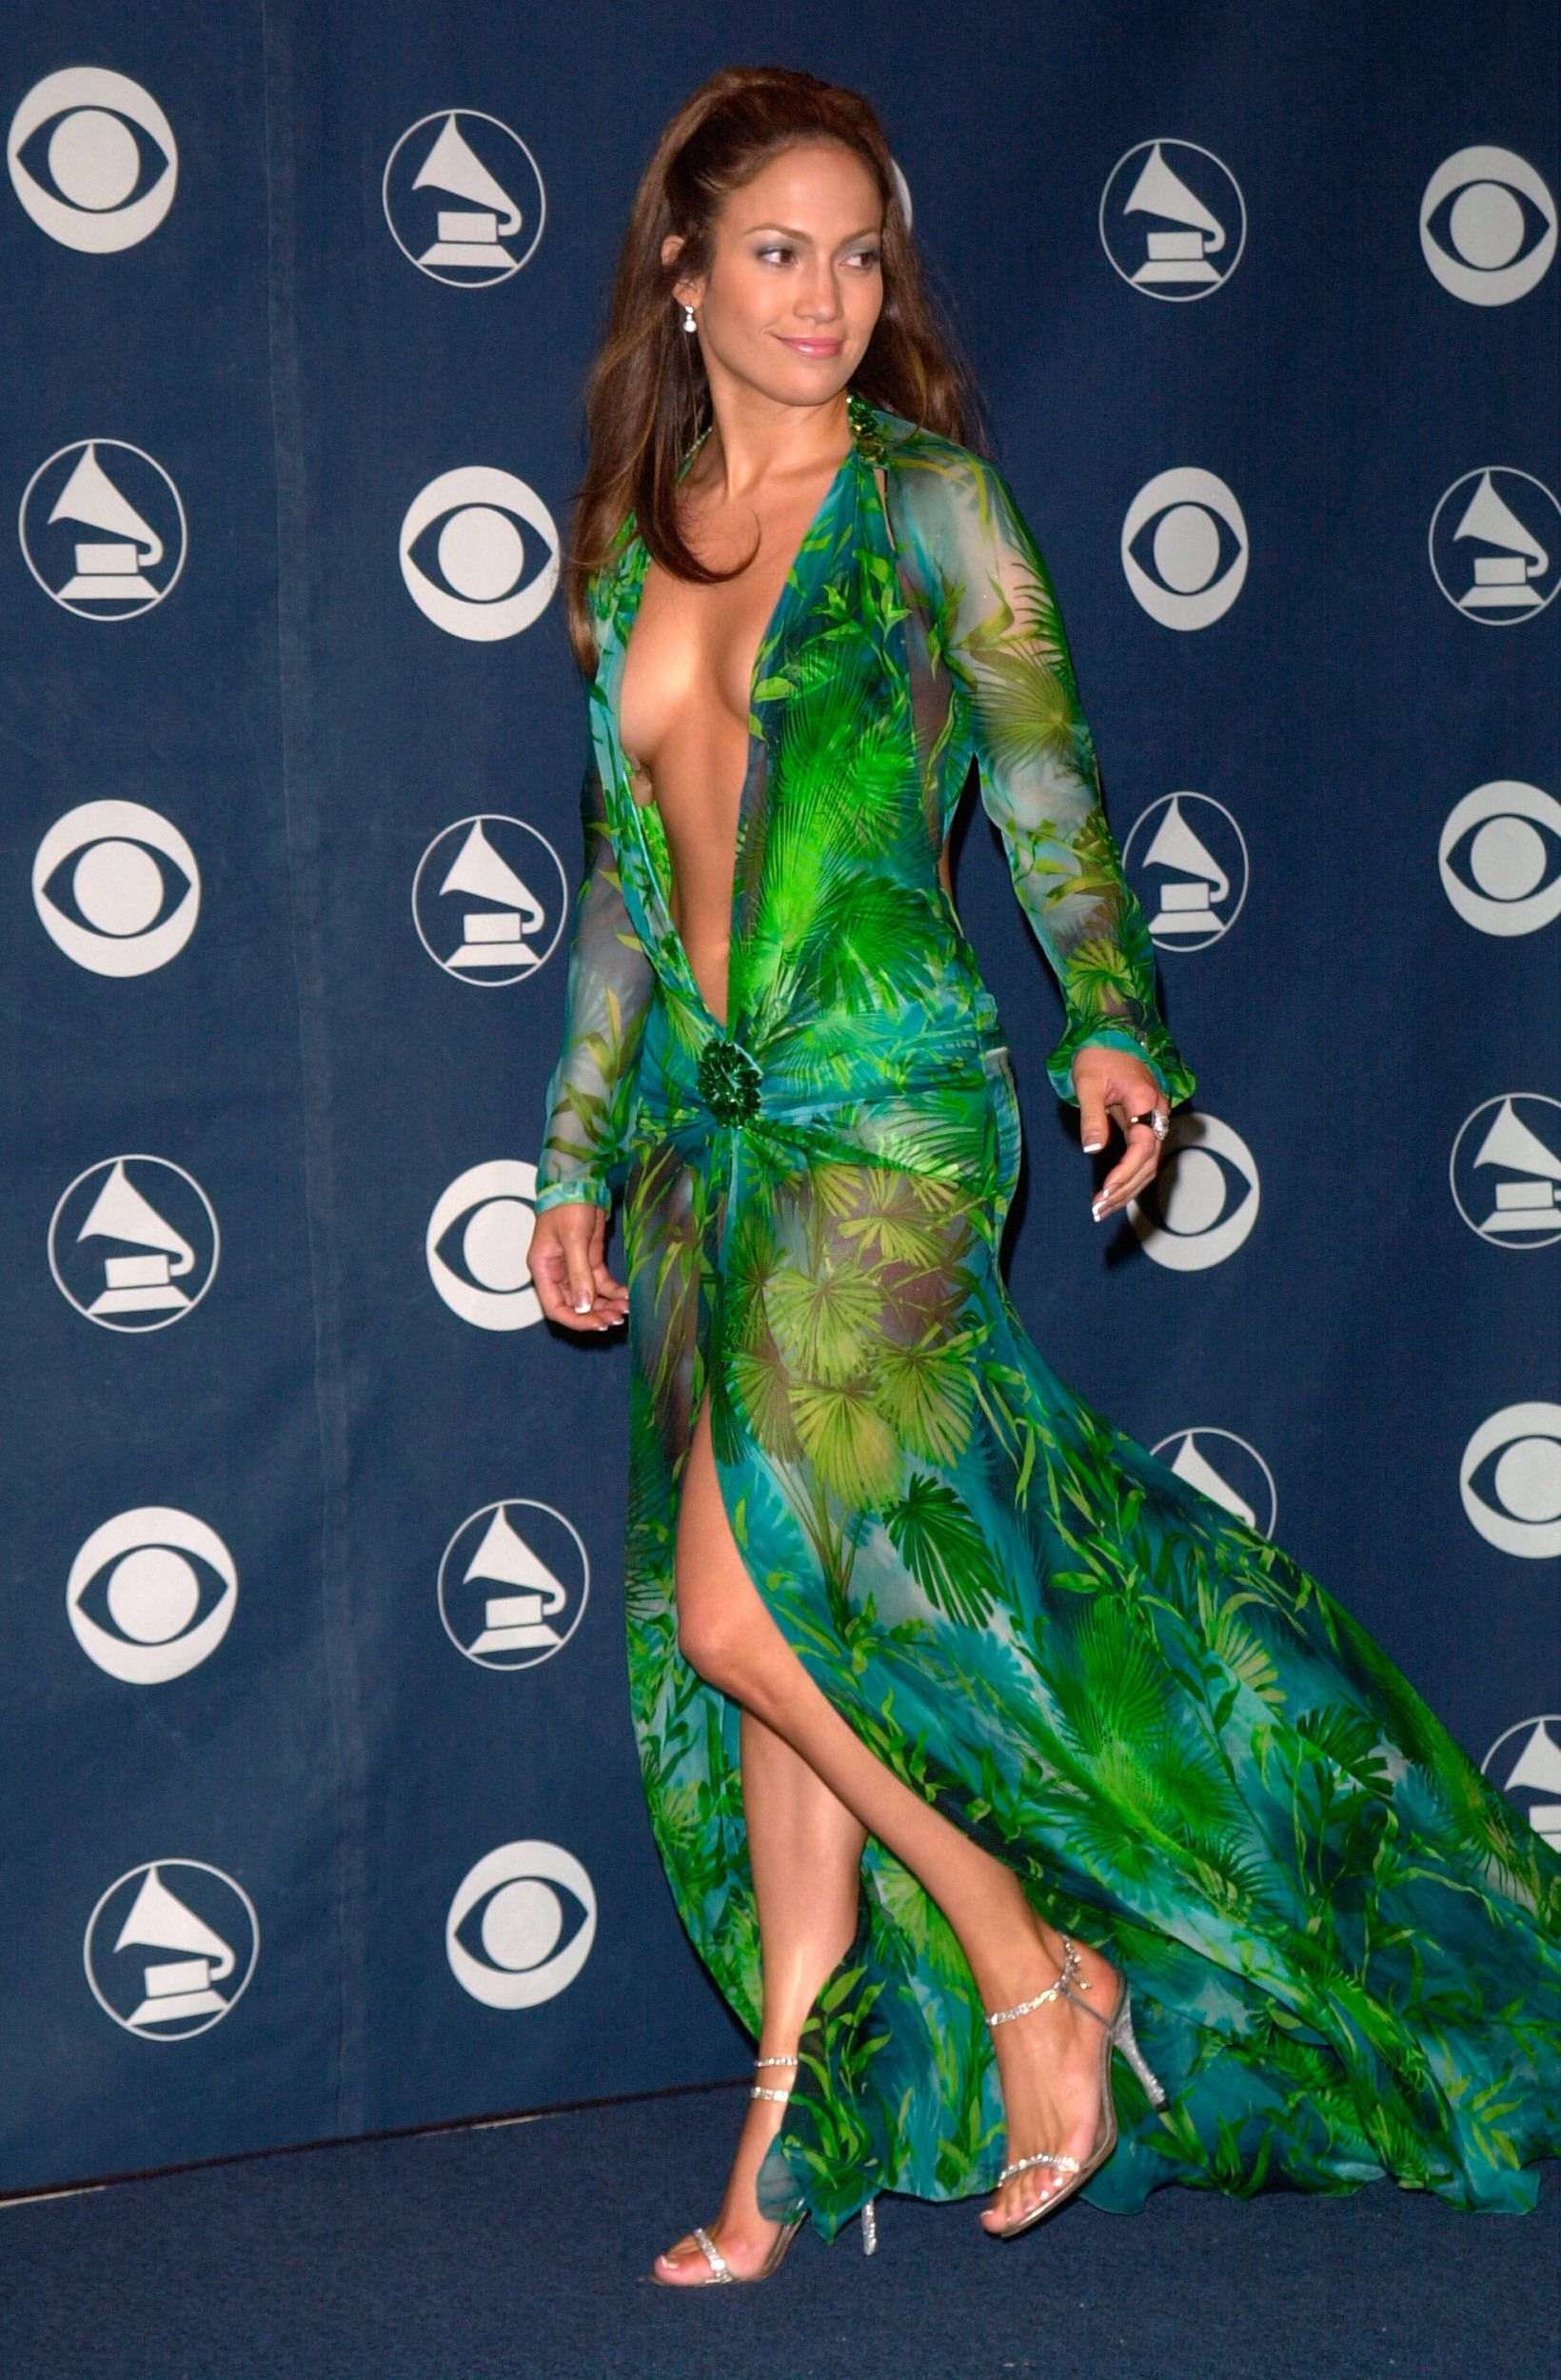 J Lo And The Infamous Dress Jennifer Lopez Dress Grammy Dresses Fashion [ 2500 x 1640 Pixel ]